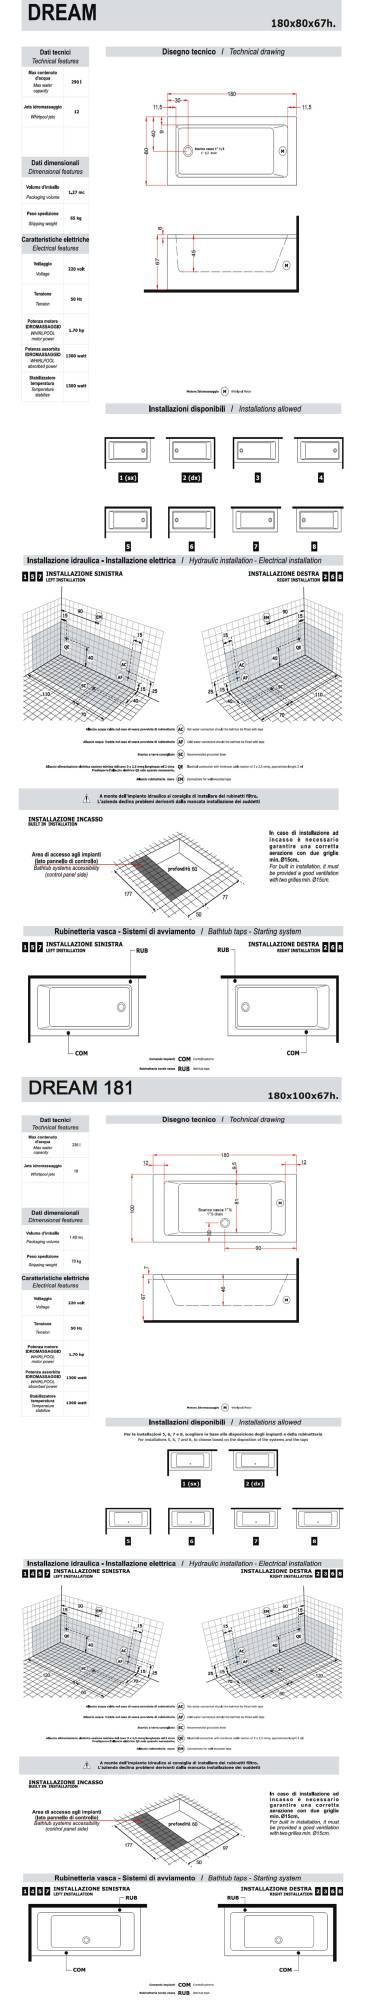 Sheet-Technical-bathtub-Treesse-Dream-180-181